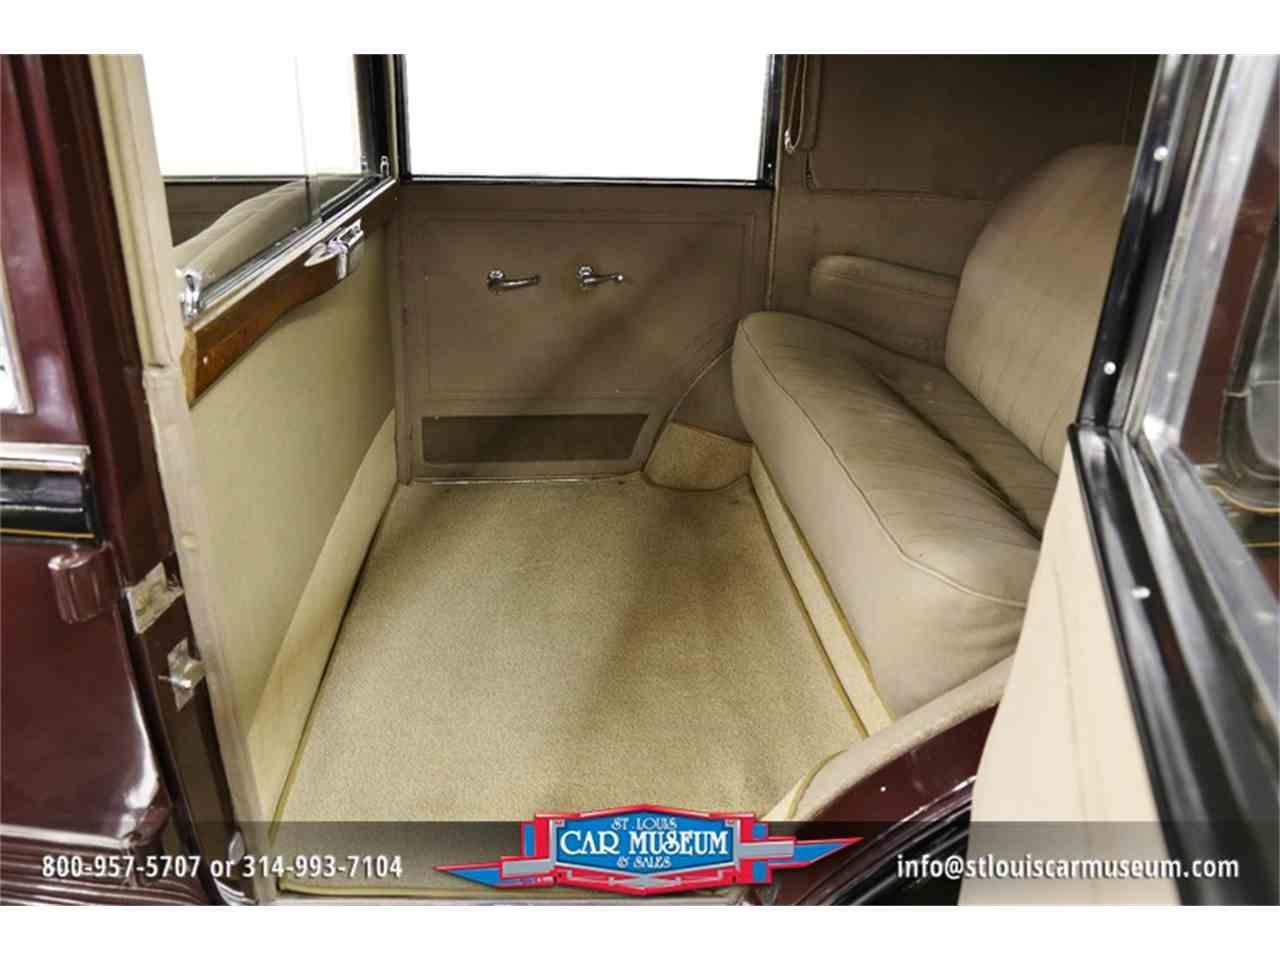 Large Picture of '31 Cadillac V-16 Madam X Landau Sedan - JSU3